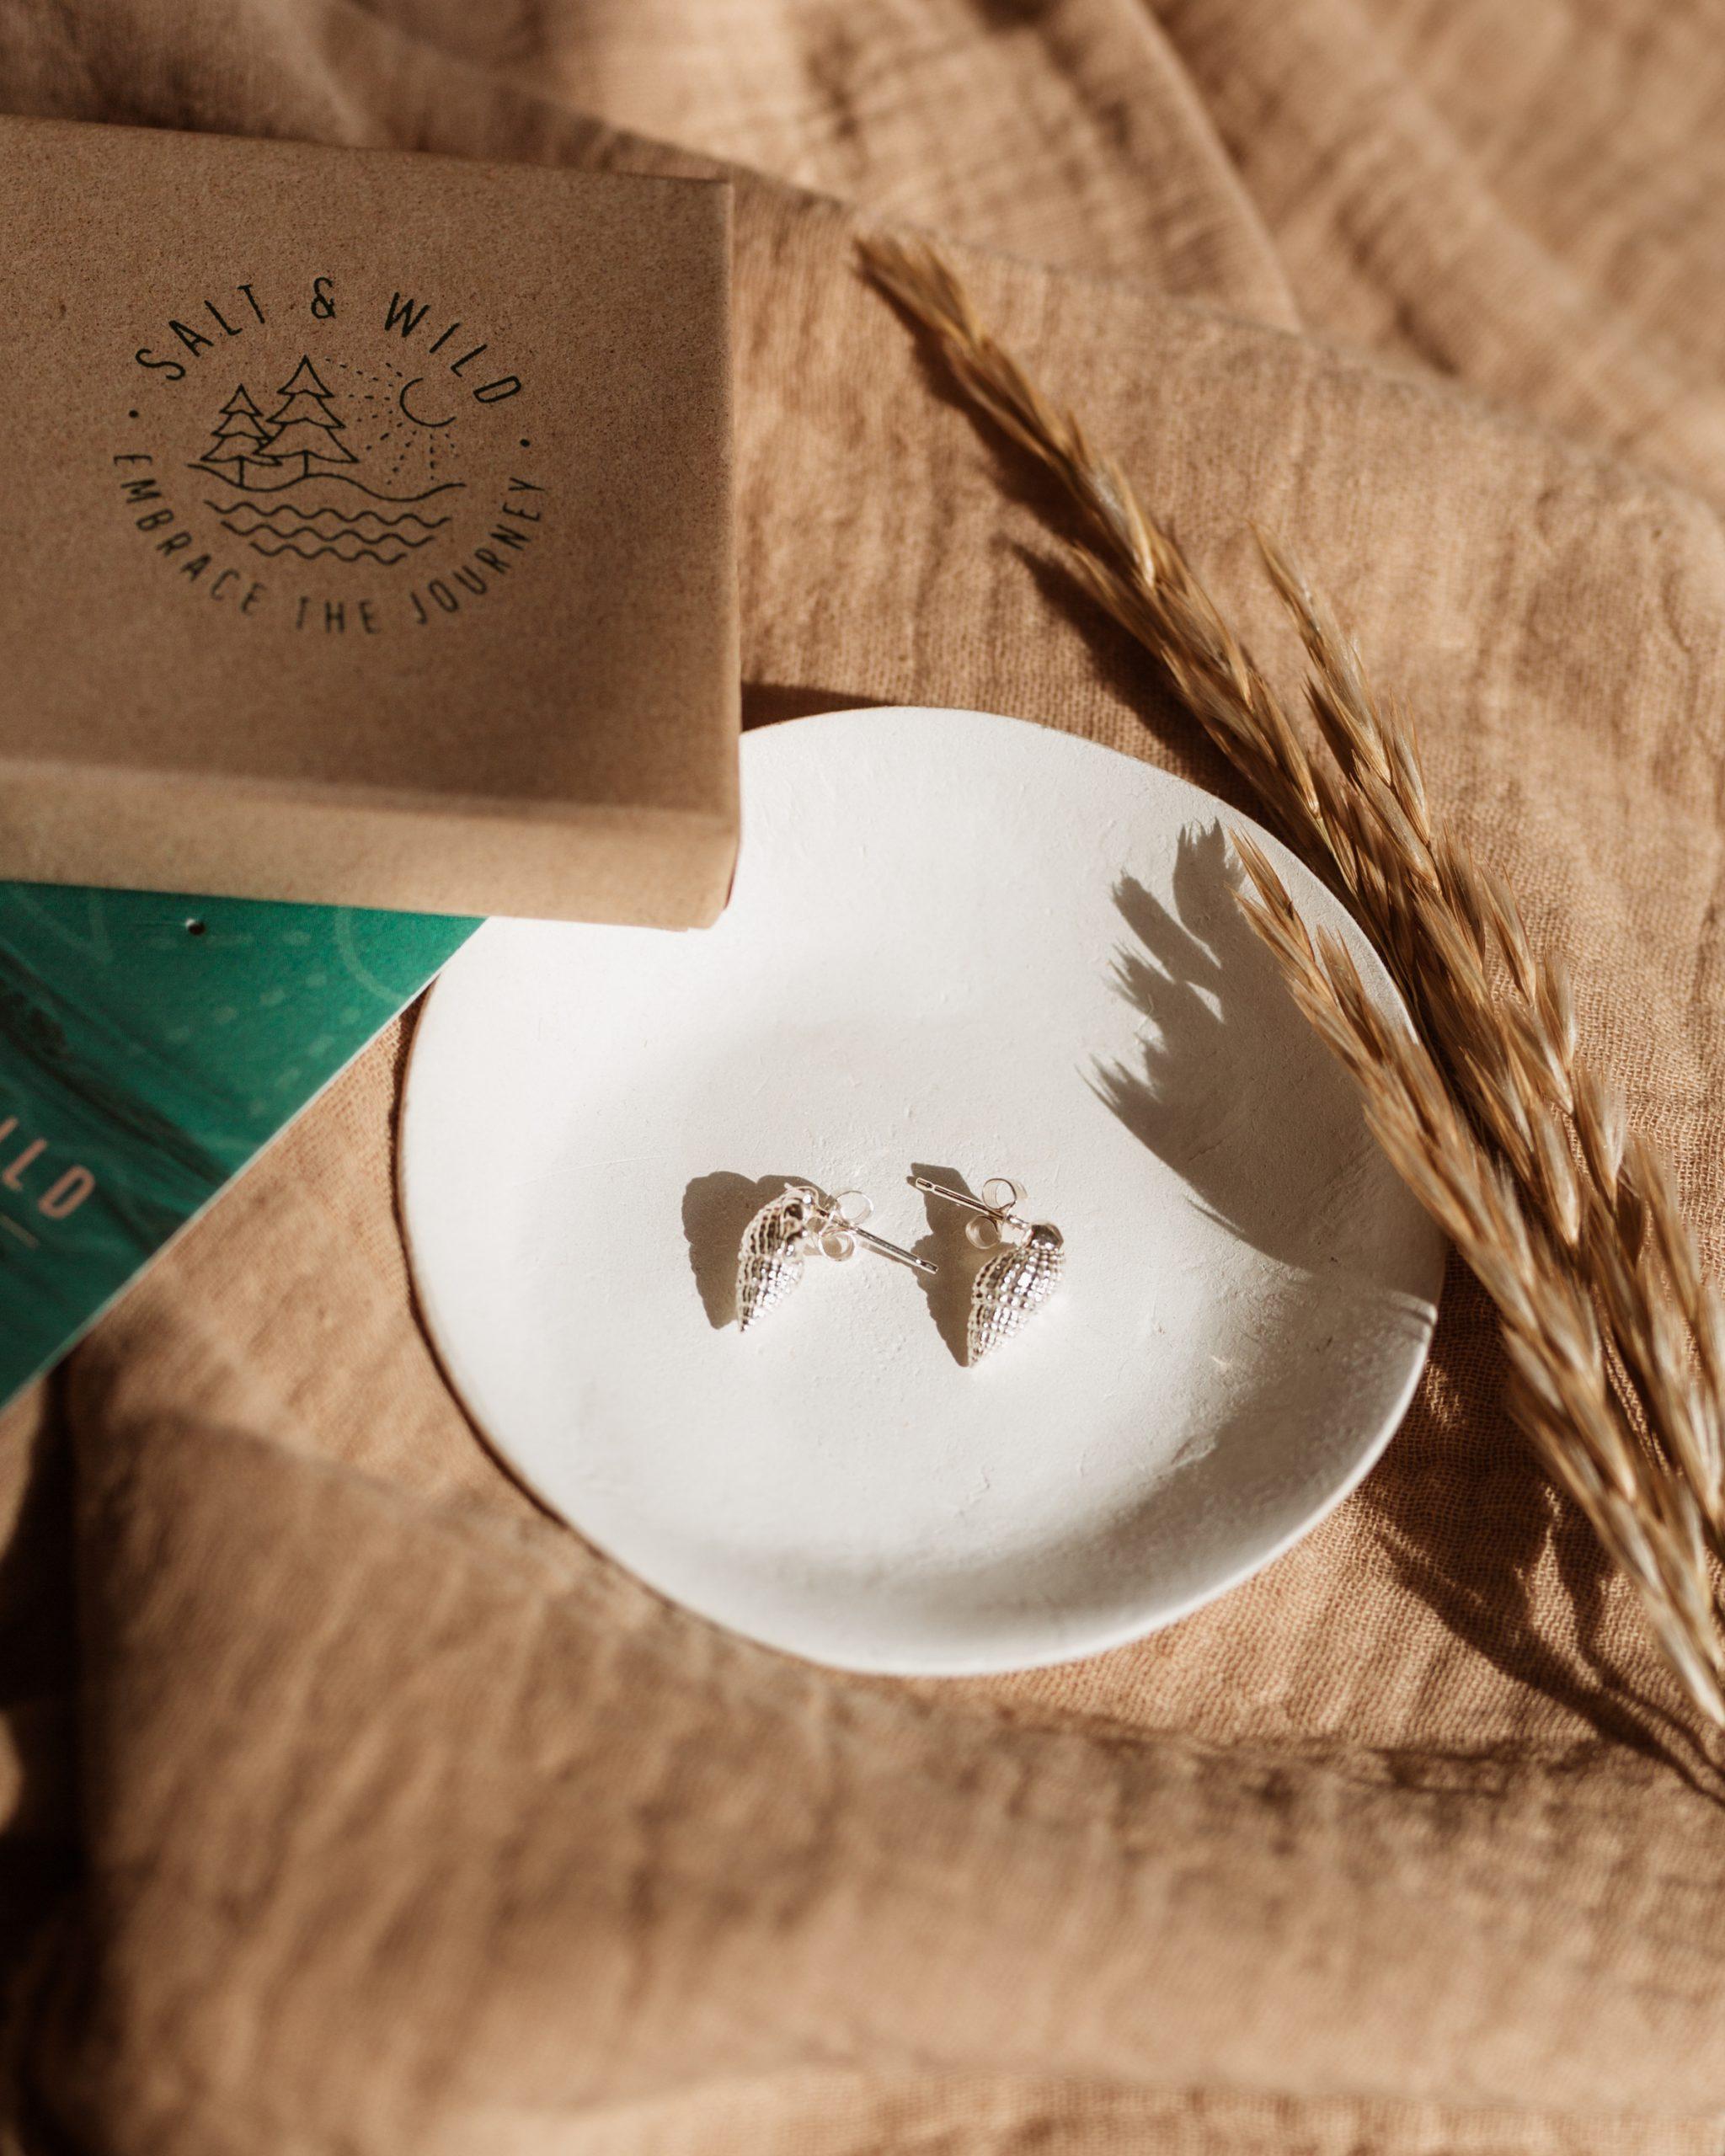 ethical silver whelk stud earrings by Salt & Wild